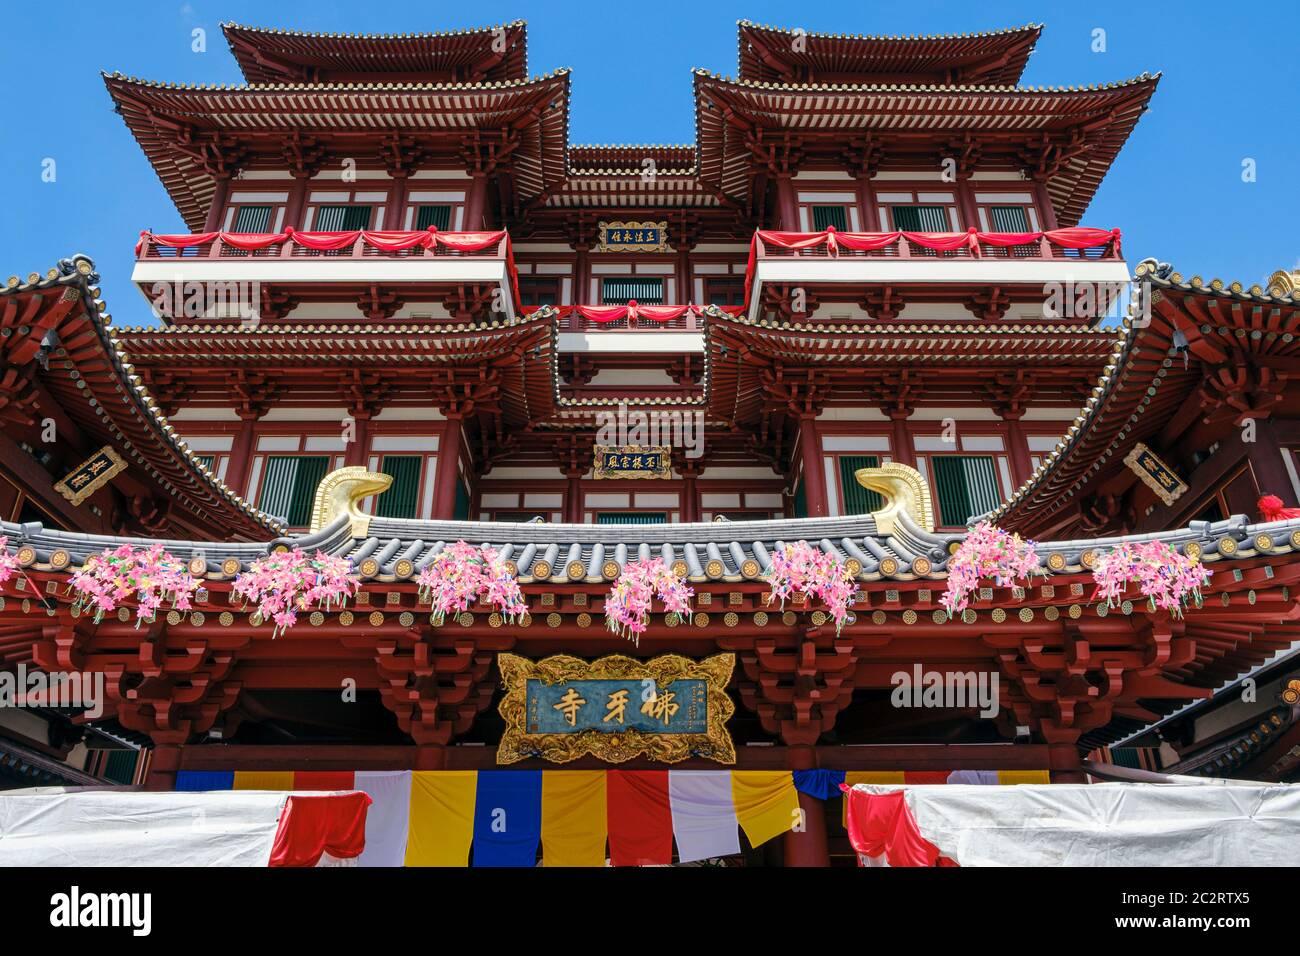 Buddha Tooth Relic Temple, Chinatown, Singapore Stock Photo